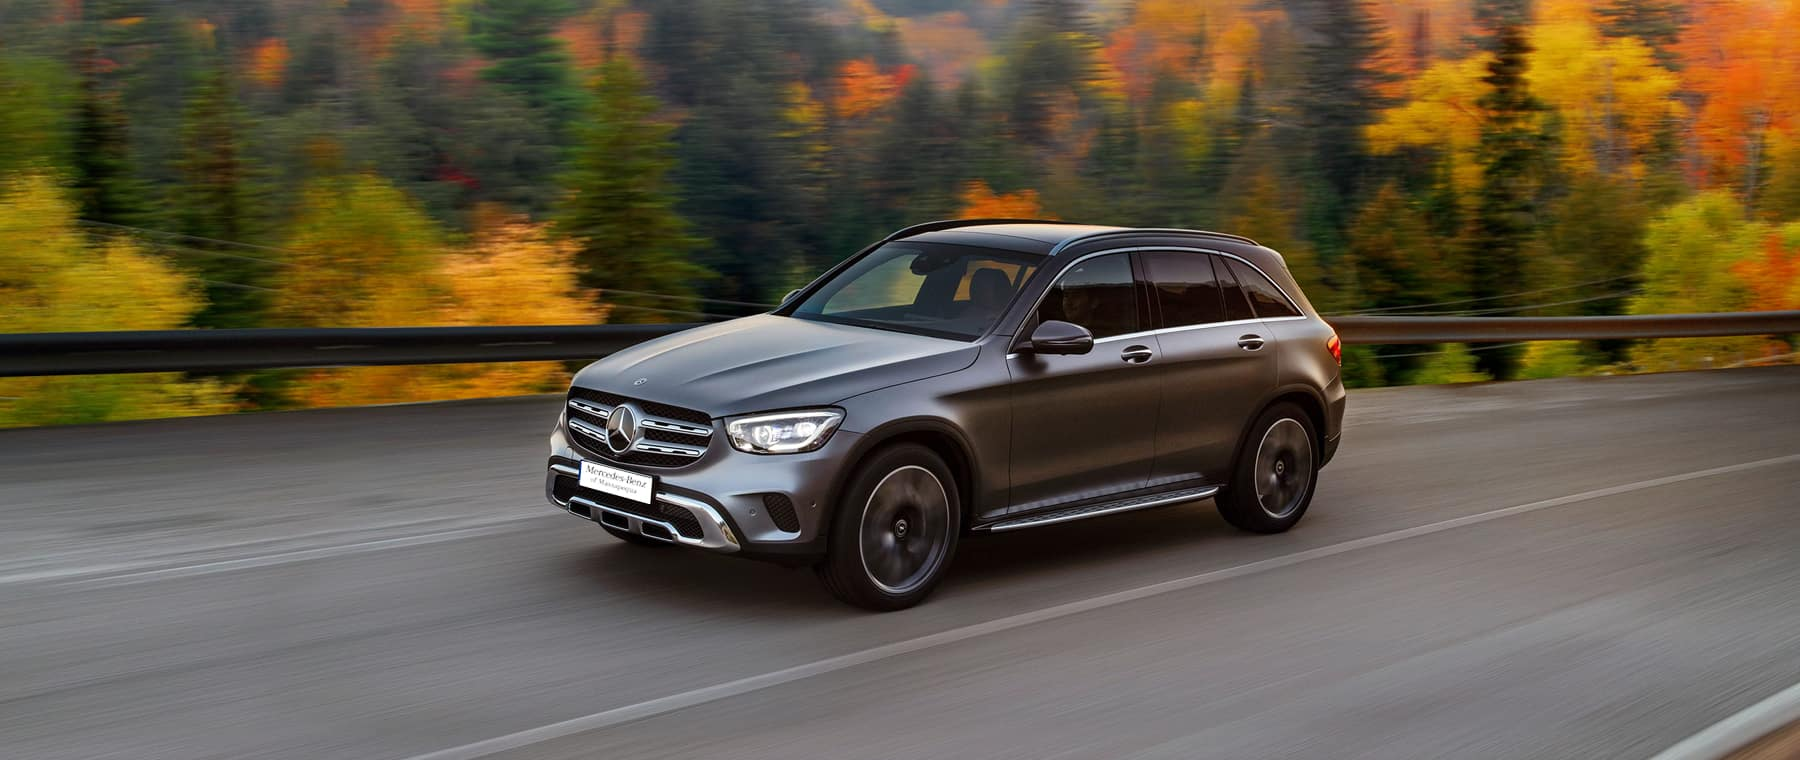 Mercedes-Benz of Massapequa | Luxury Auto Dealership